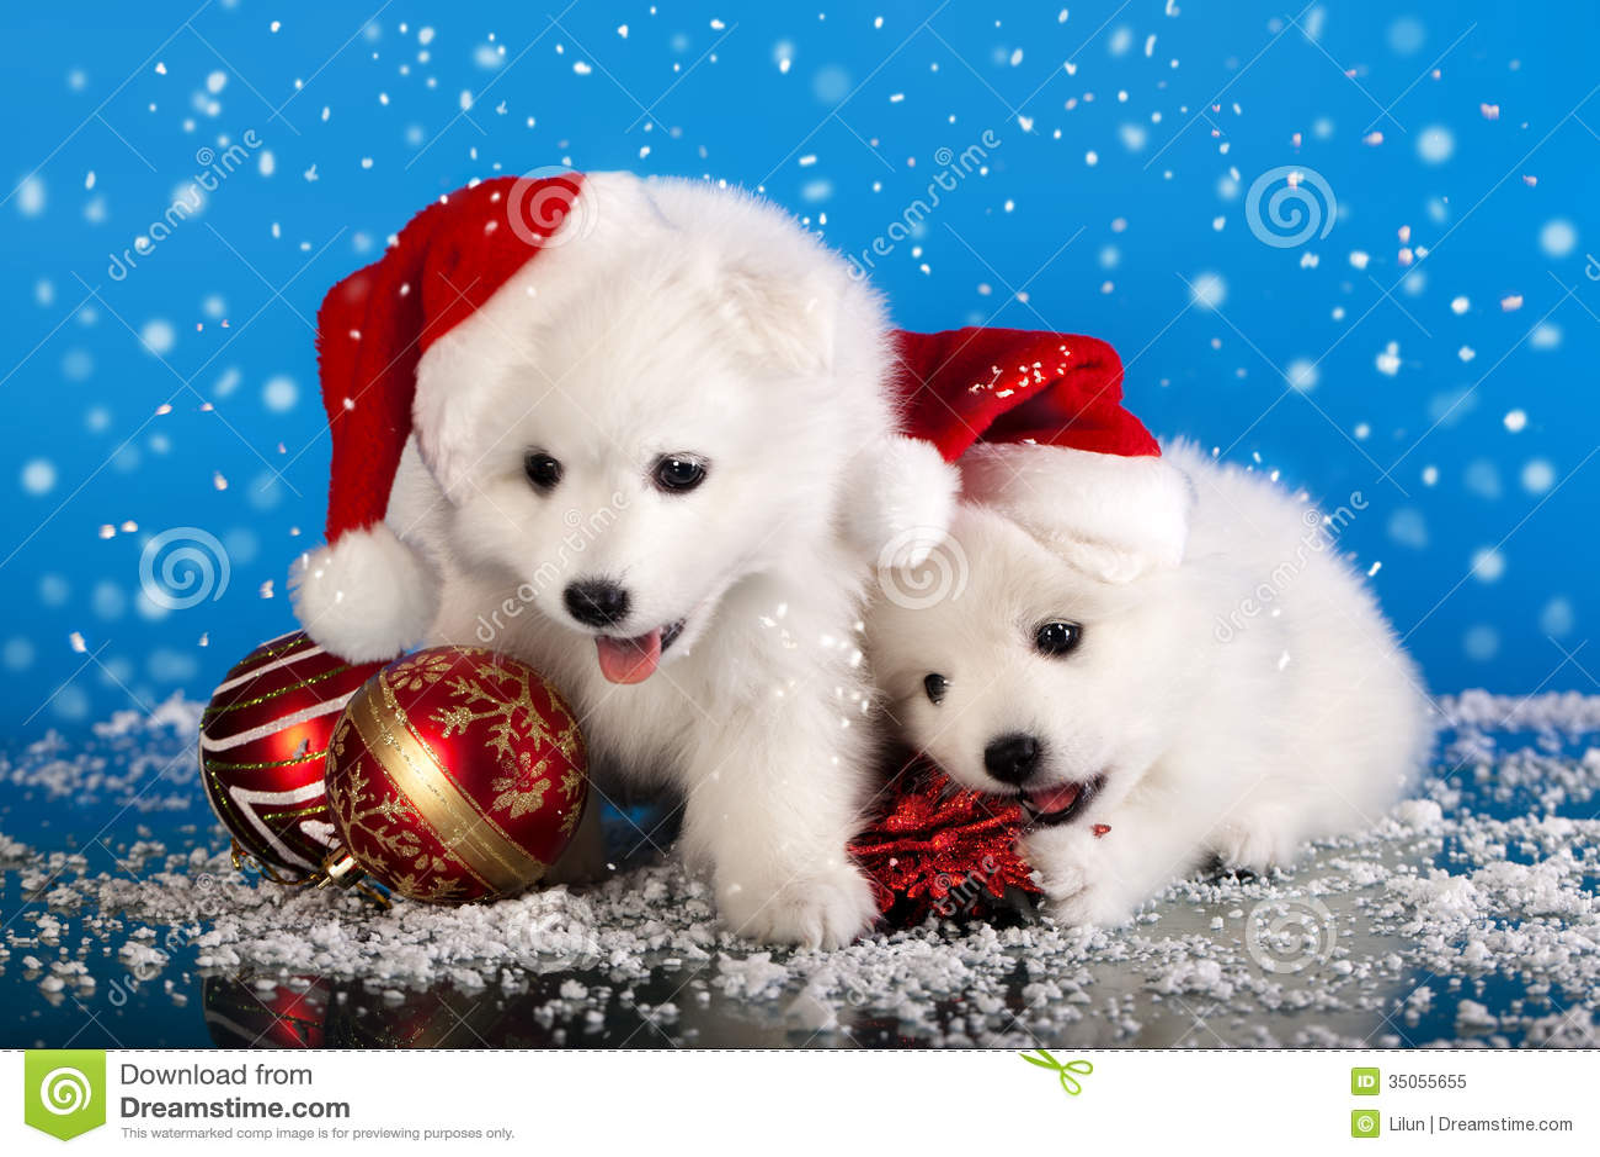 Christmas Puppies Spitz Stock Image Image Of Christmas